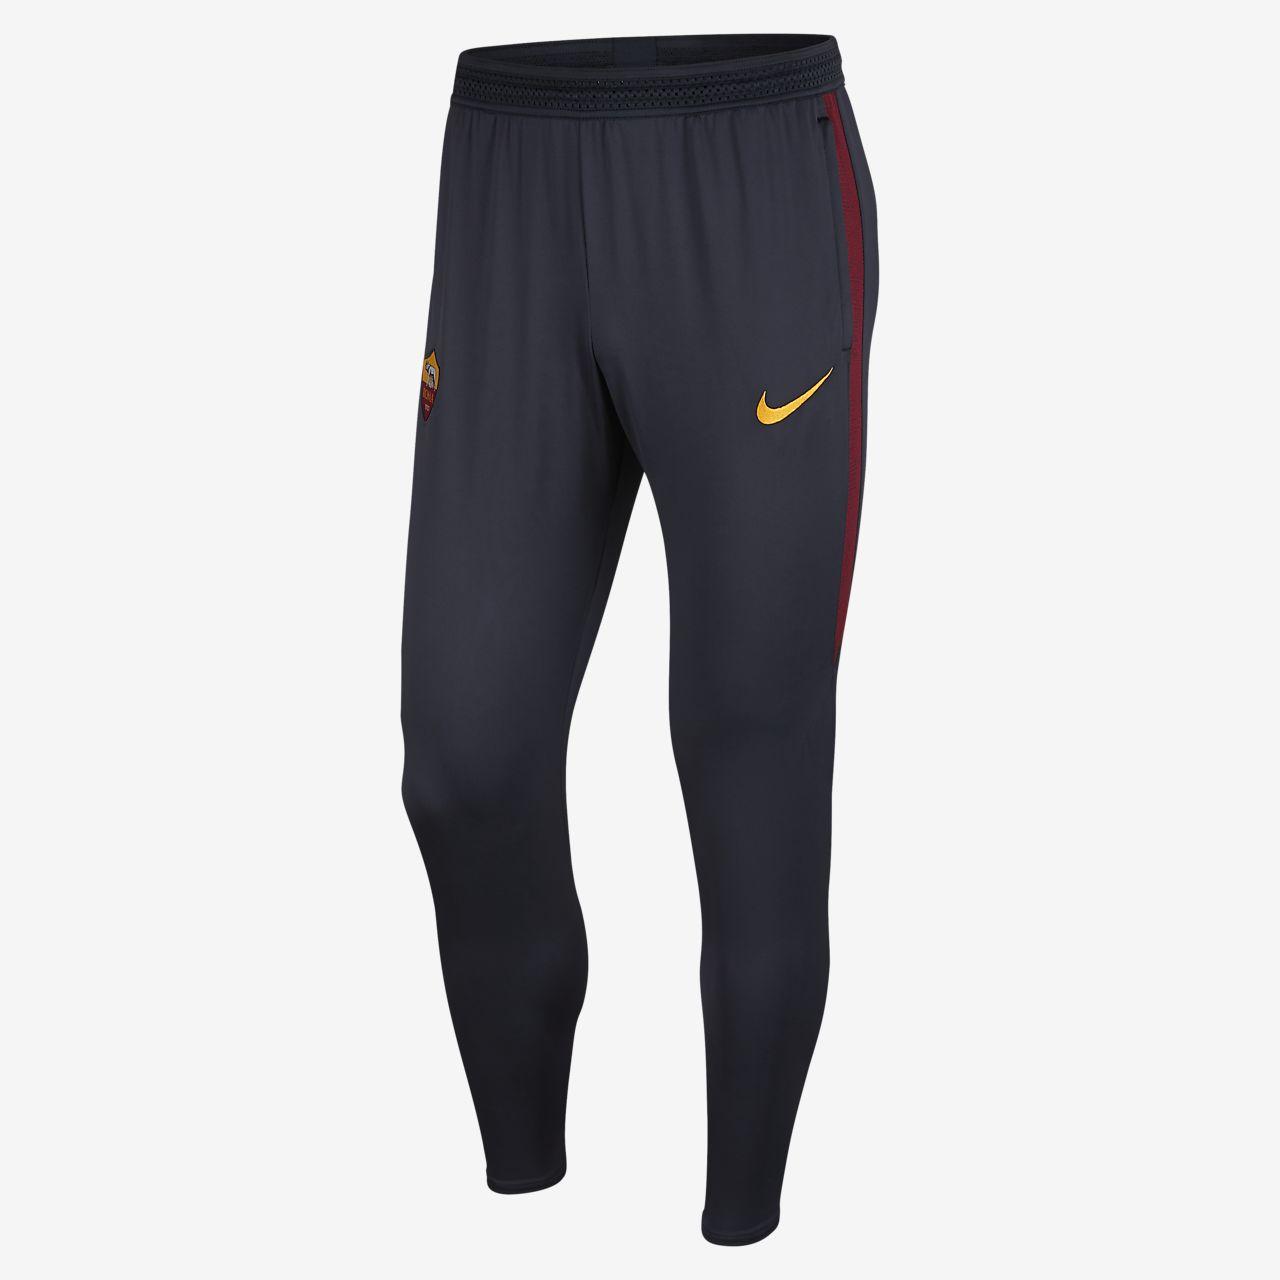 Pantaloni da calcio Nike Dri-FIT A.S. Roma Strike - Uomo